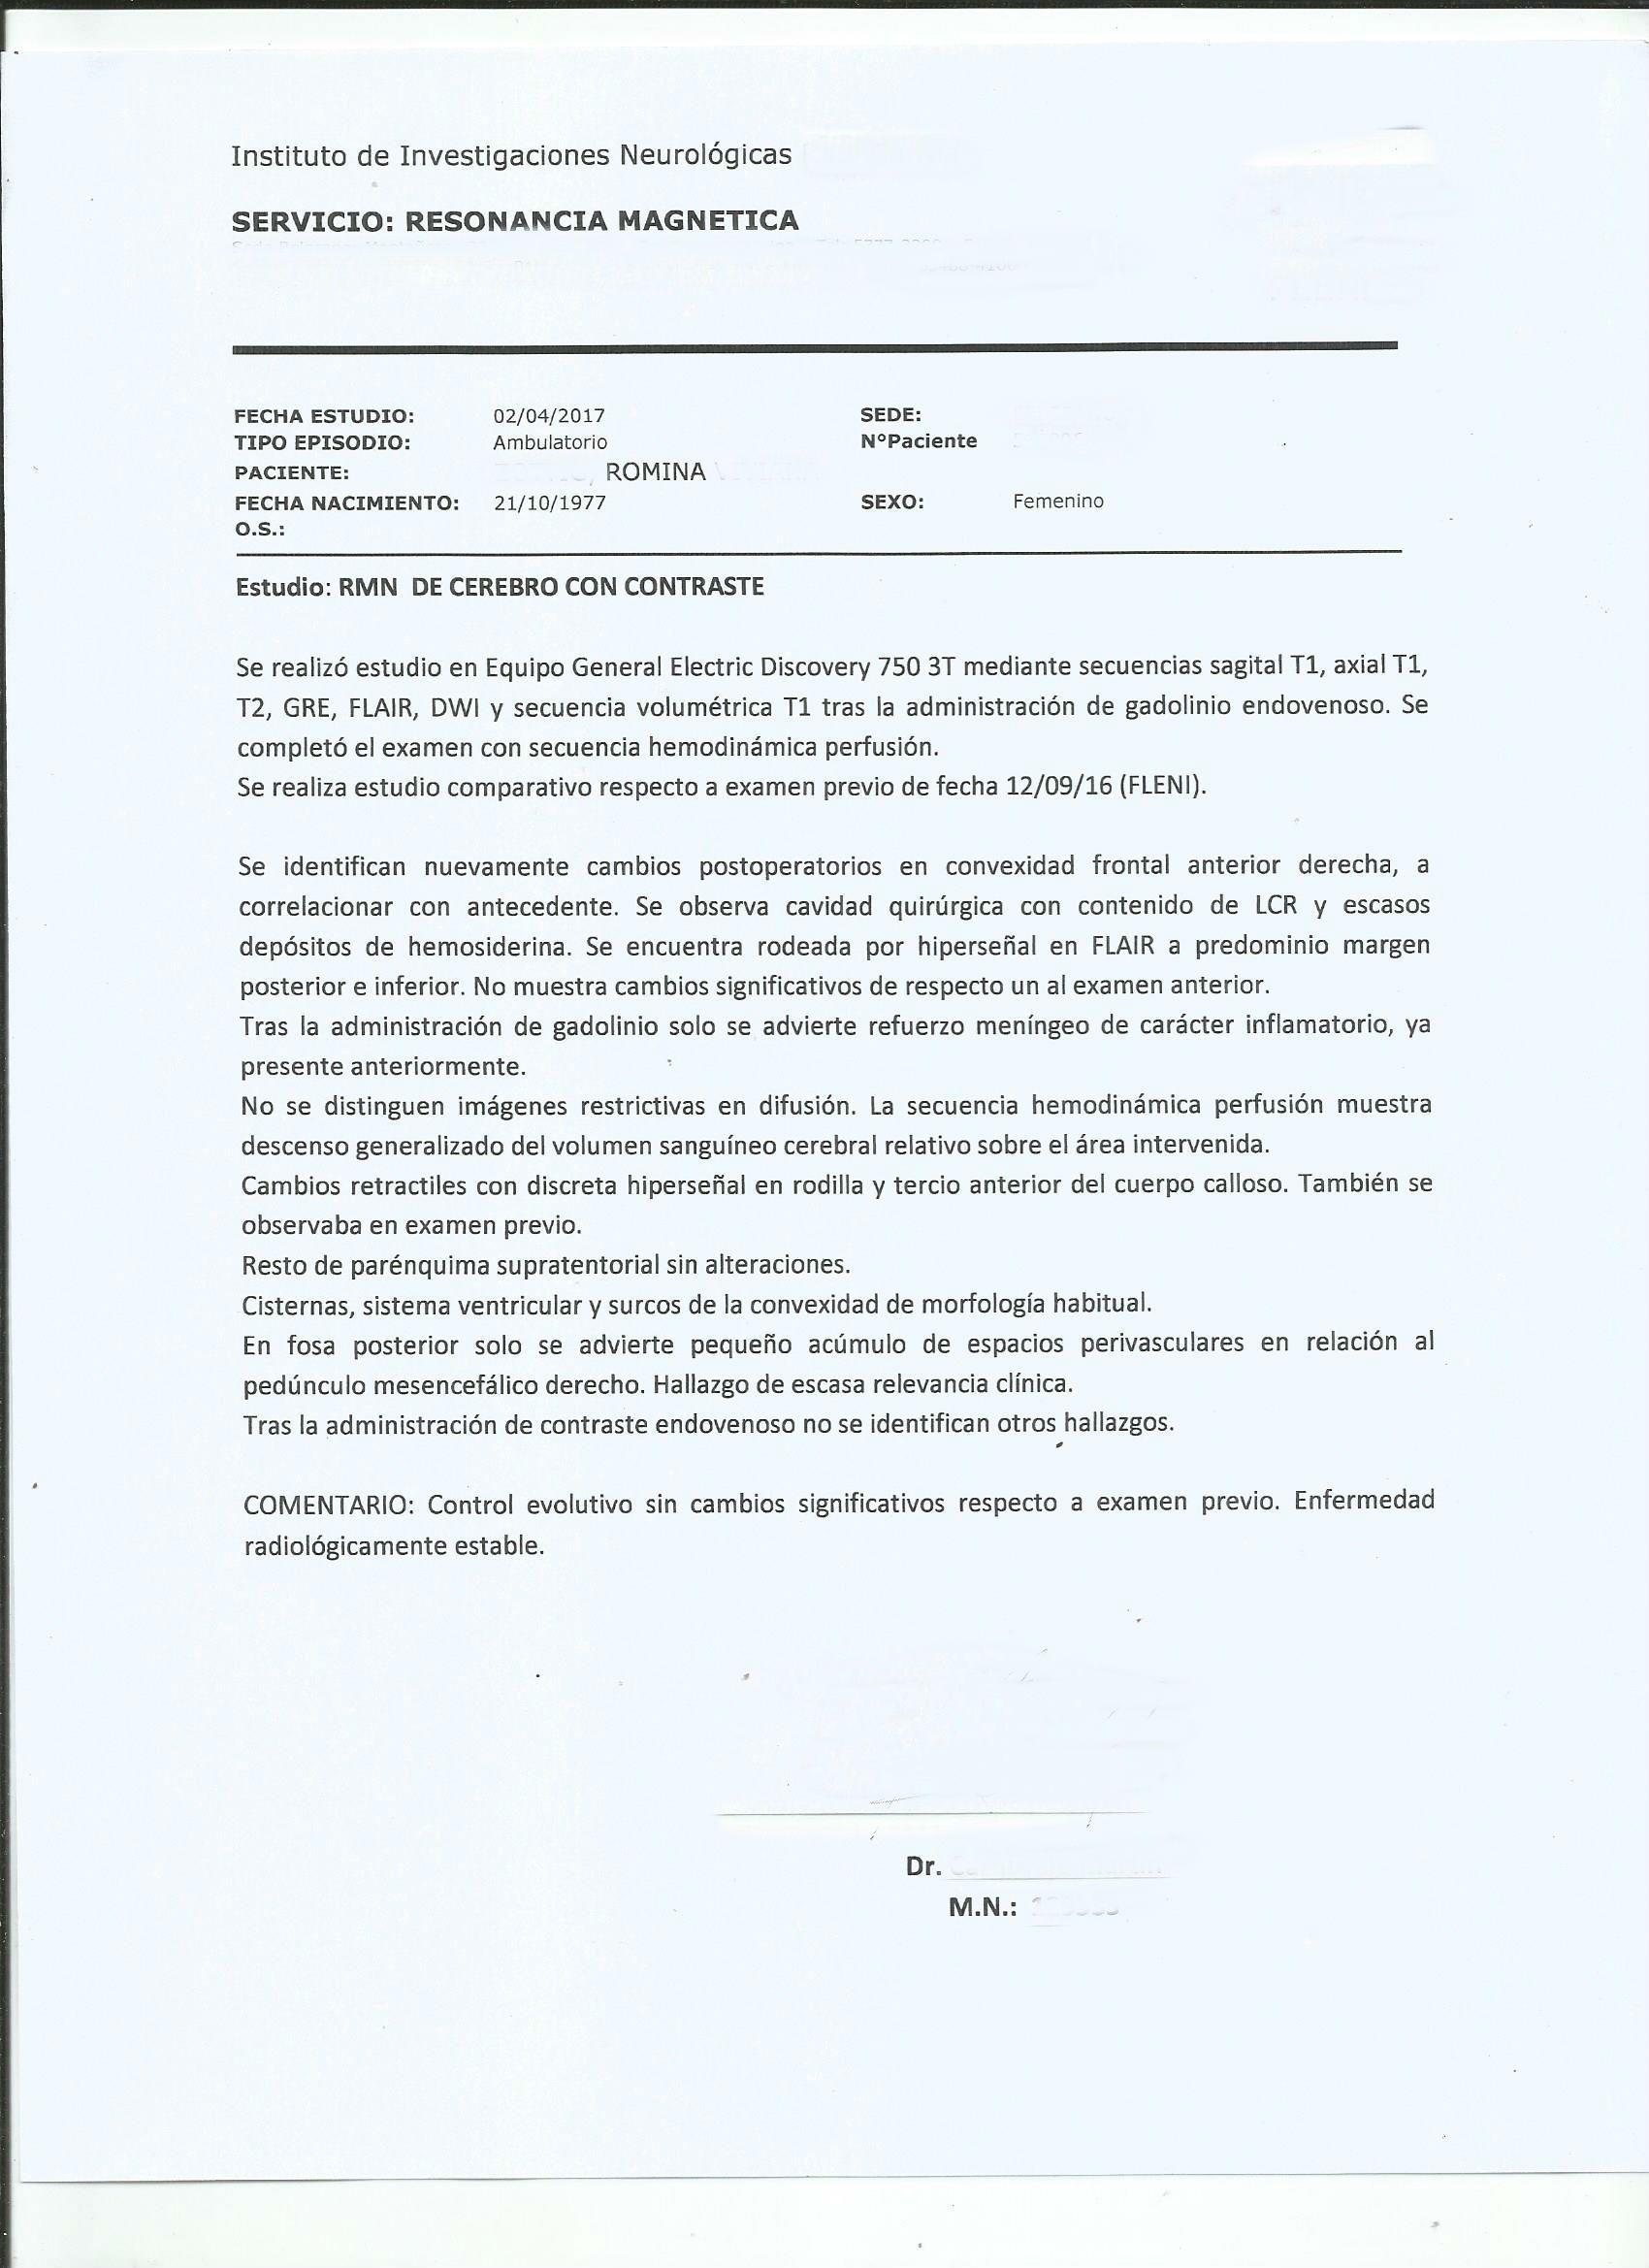 LifEscozul® - Romina 6 - Cáncer Cerebral